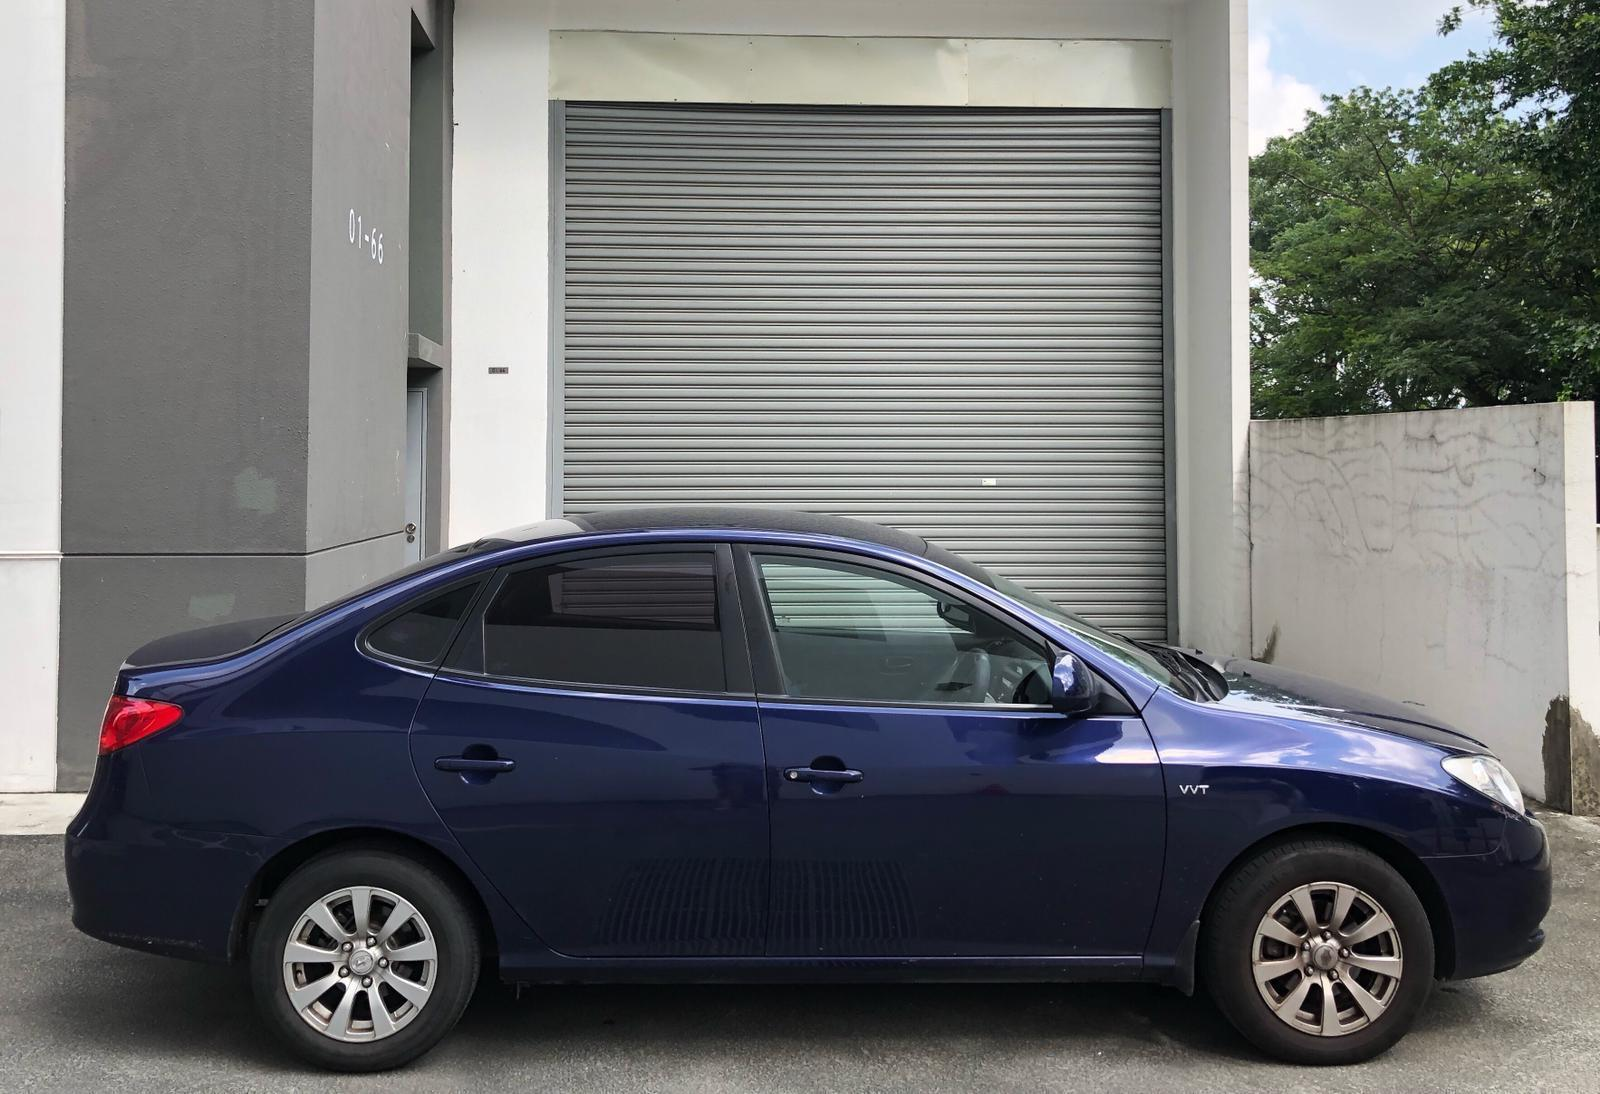 Hyundai Avante SUPER Cheap Rental for PHV Grab GoJek Ryde or Personal use